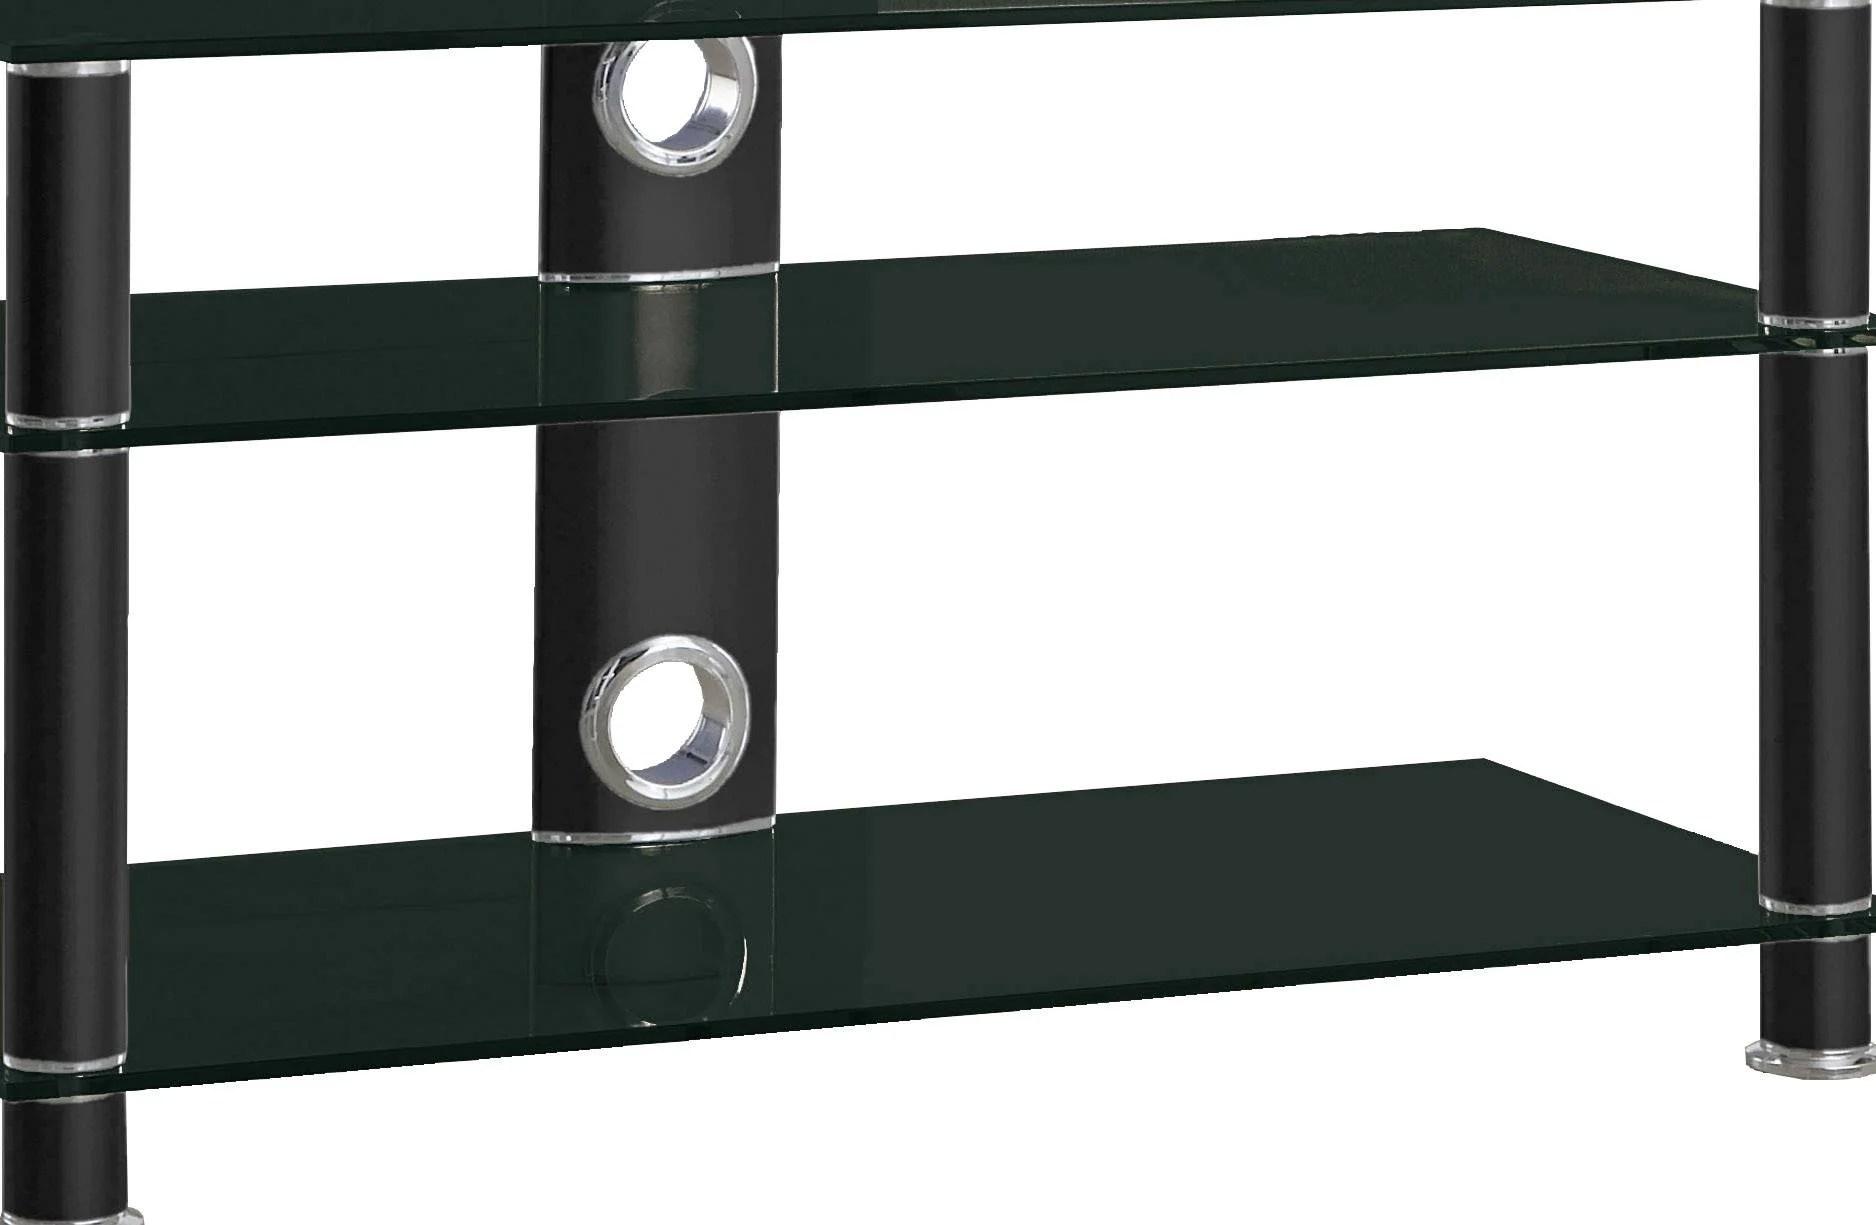 Tv Tafel Ikea : Ikea tv meubel zwart bruin ikea tv kastje